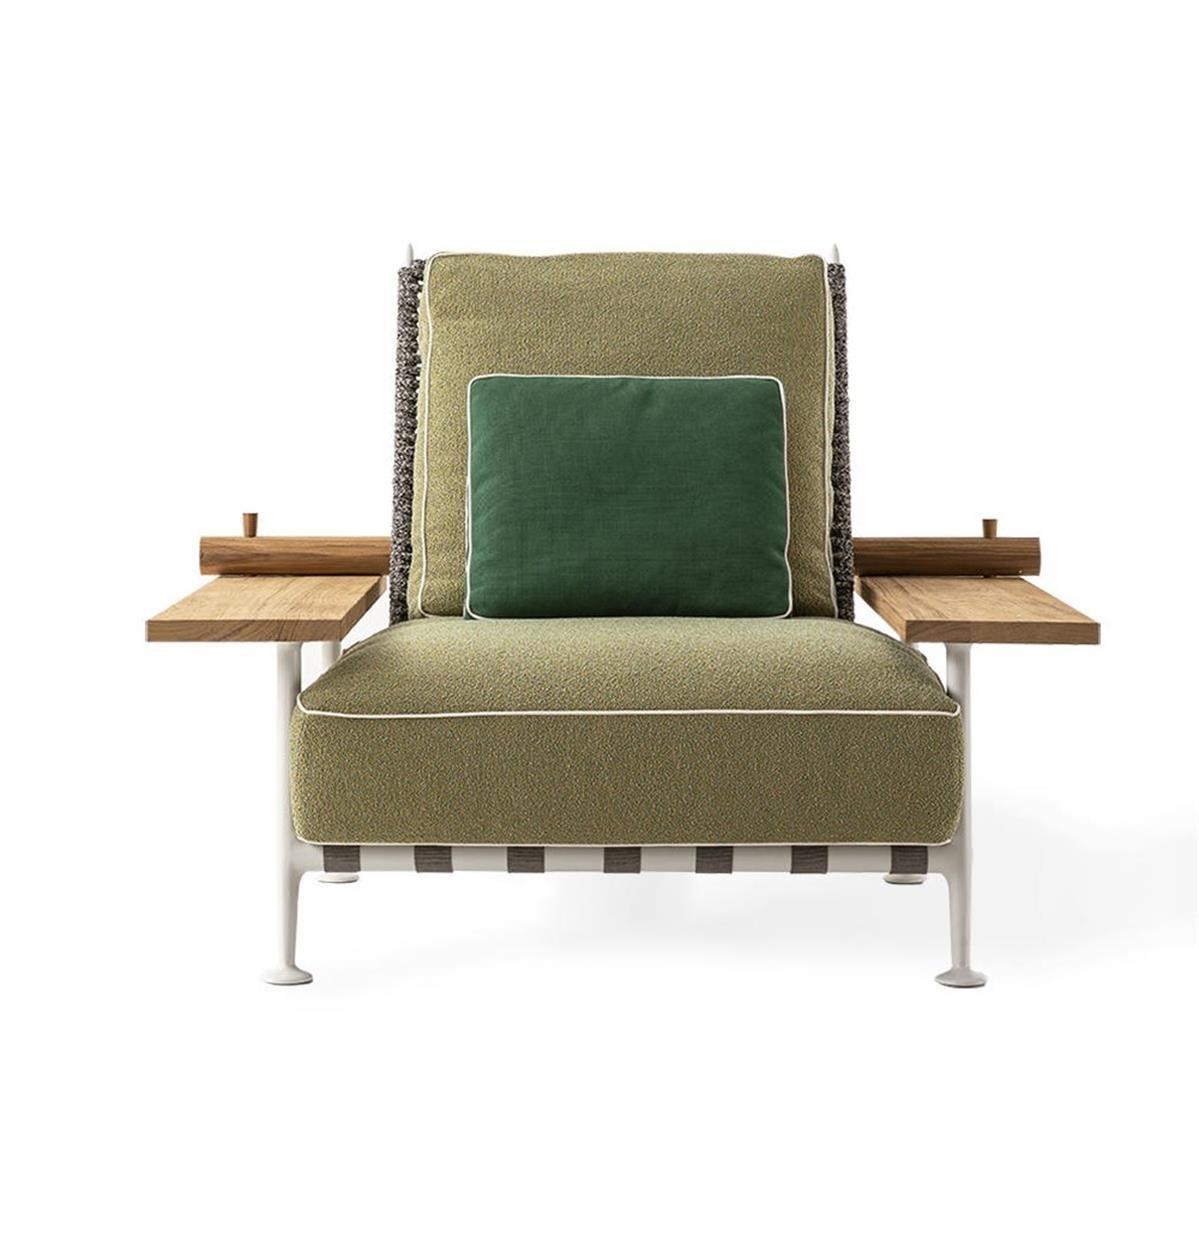 Cassina Starck Fenc Enature Armchair Outdoor 1200